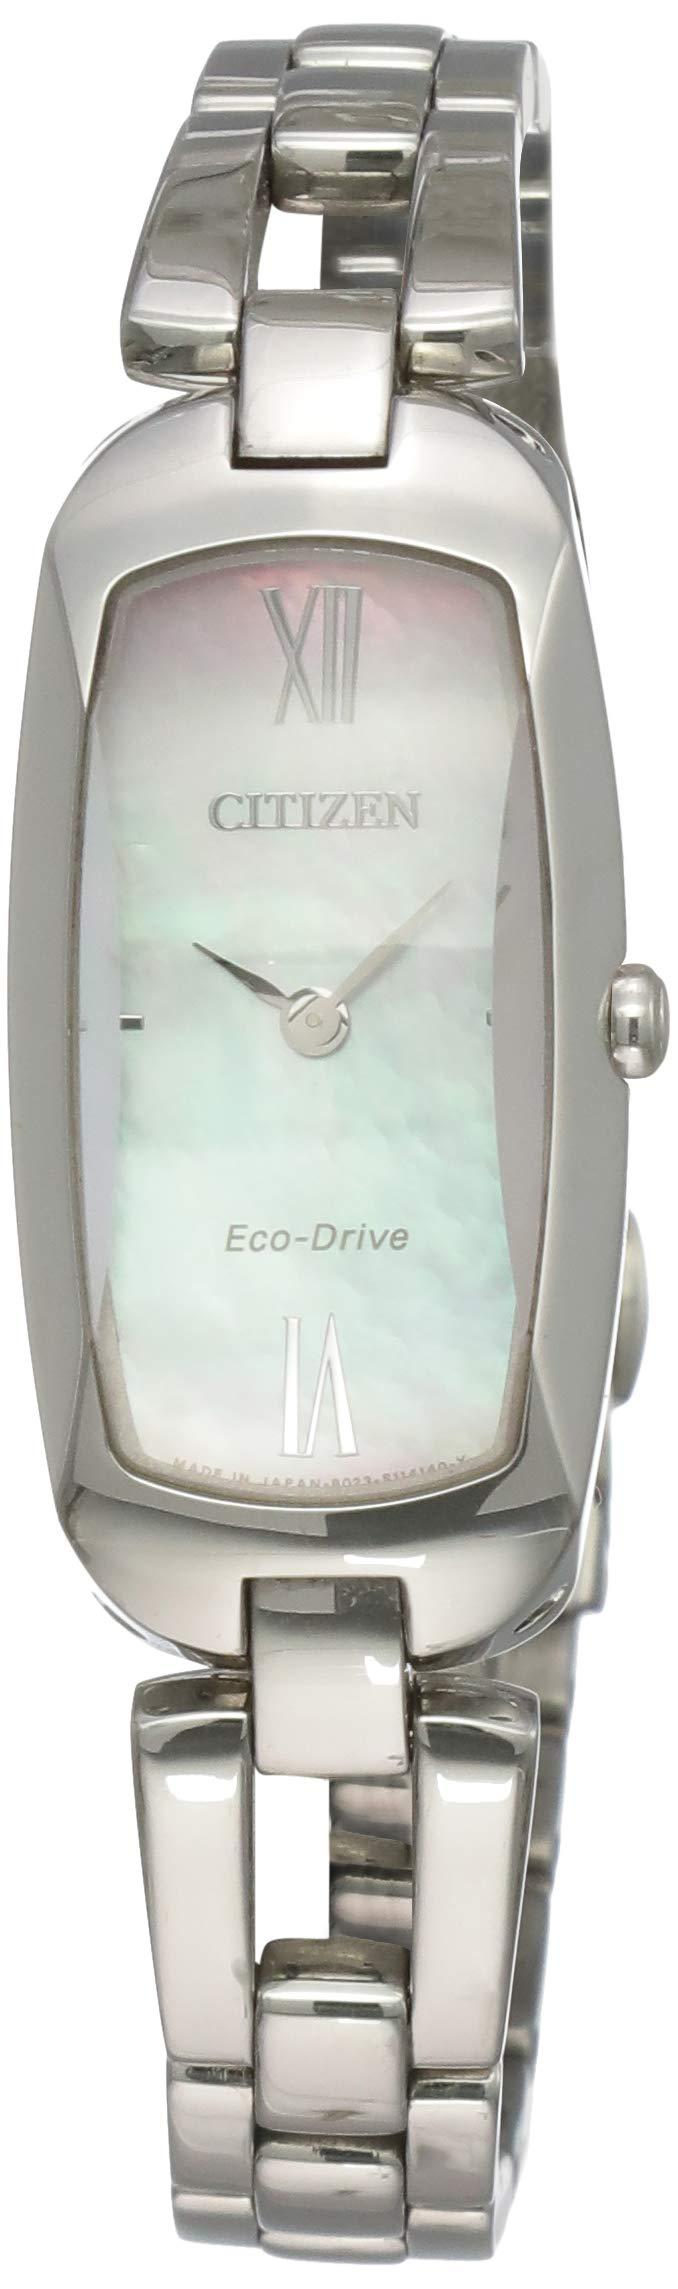 Damen-Armbanduhr XS  L Analog Quarz Edelstahl EX1100-51D